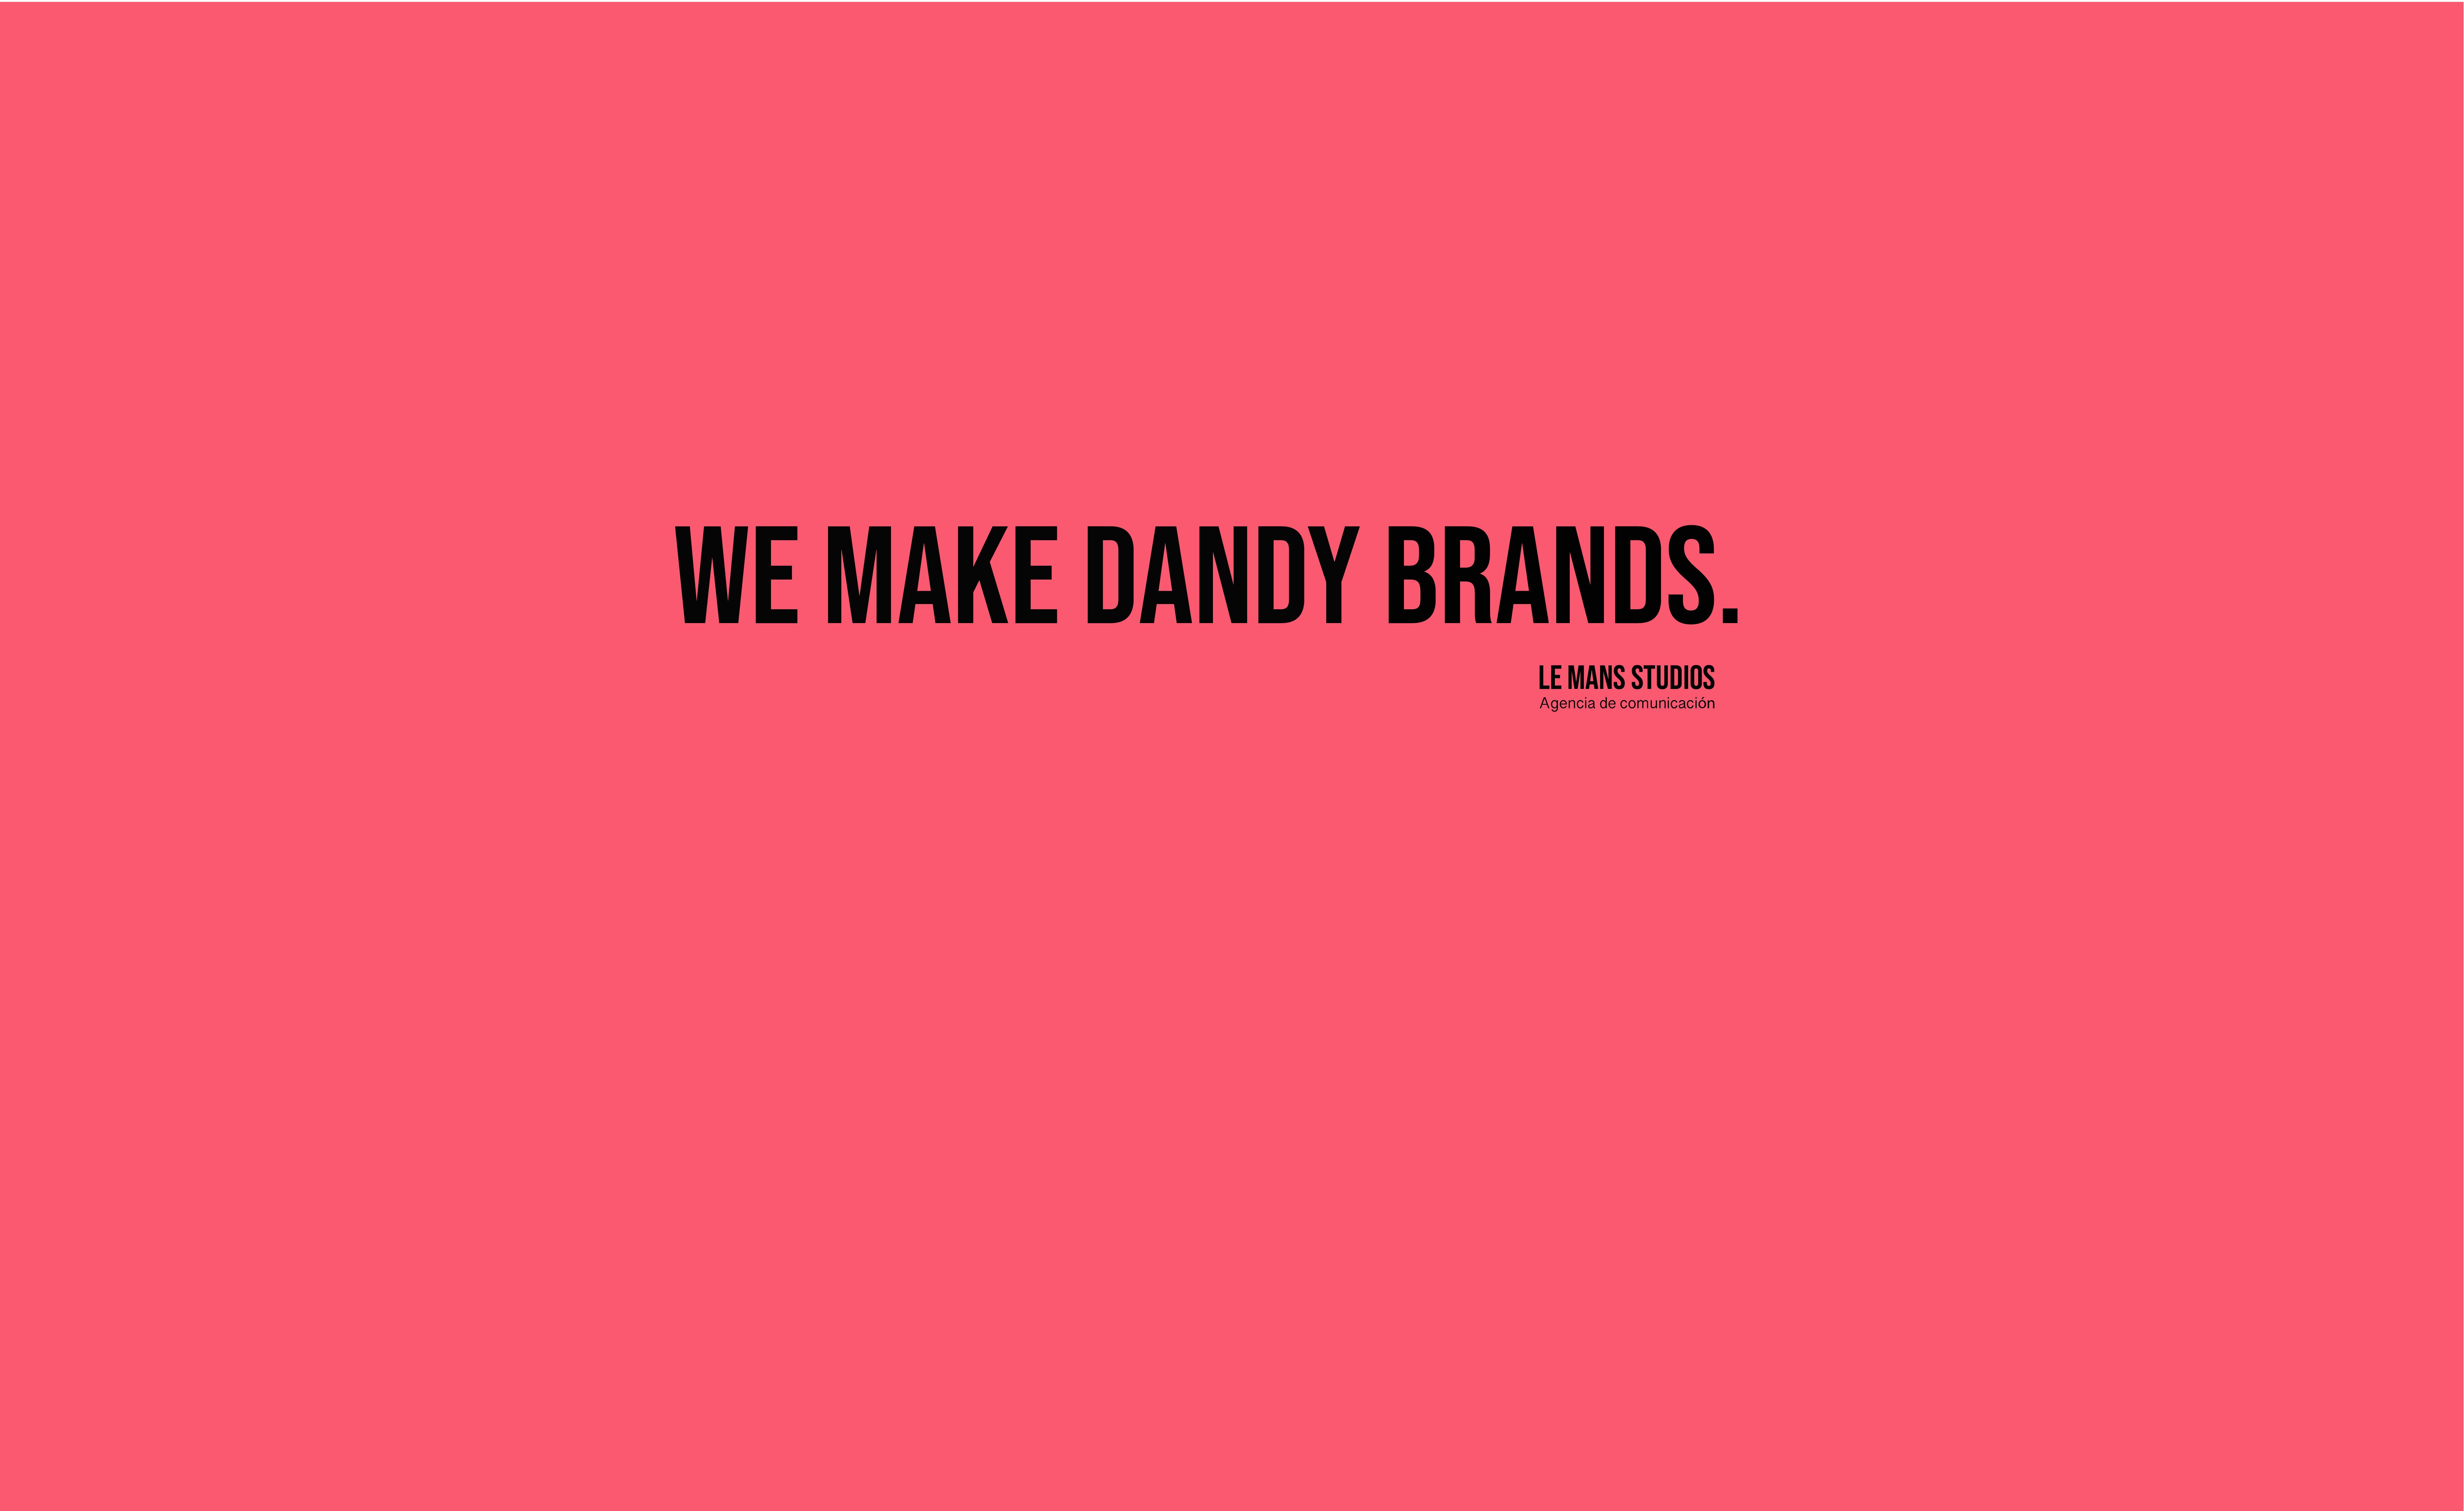 We make dandy brands.